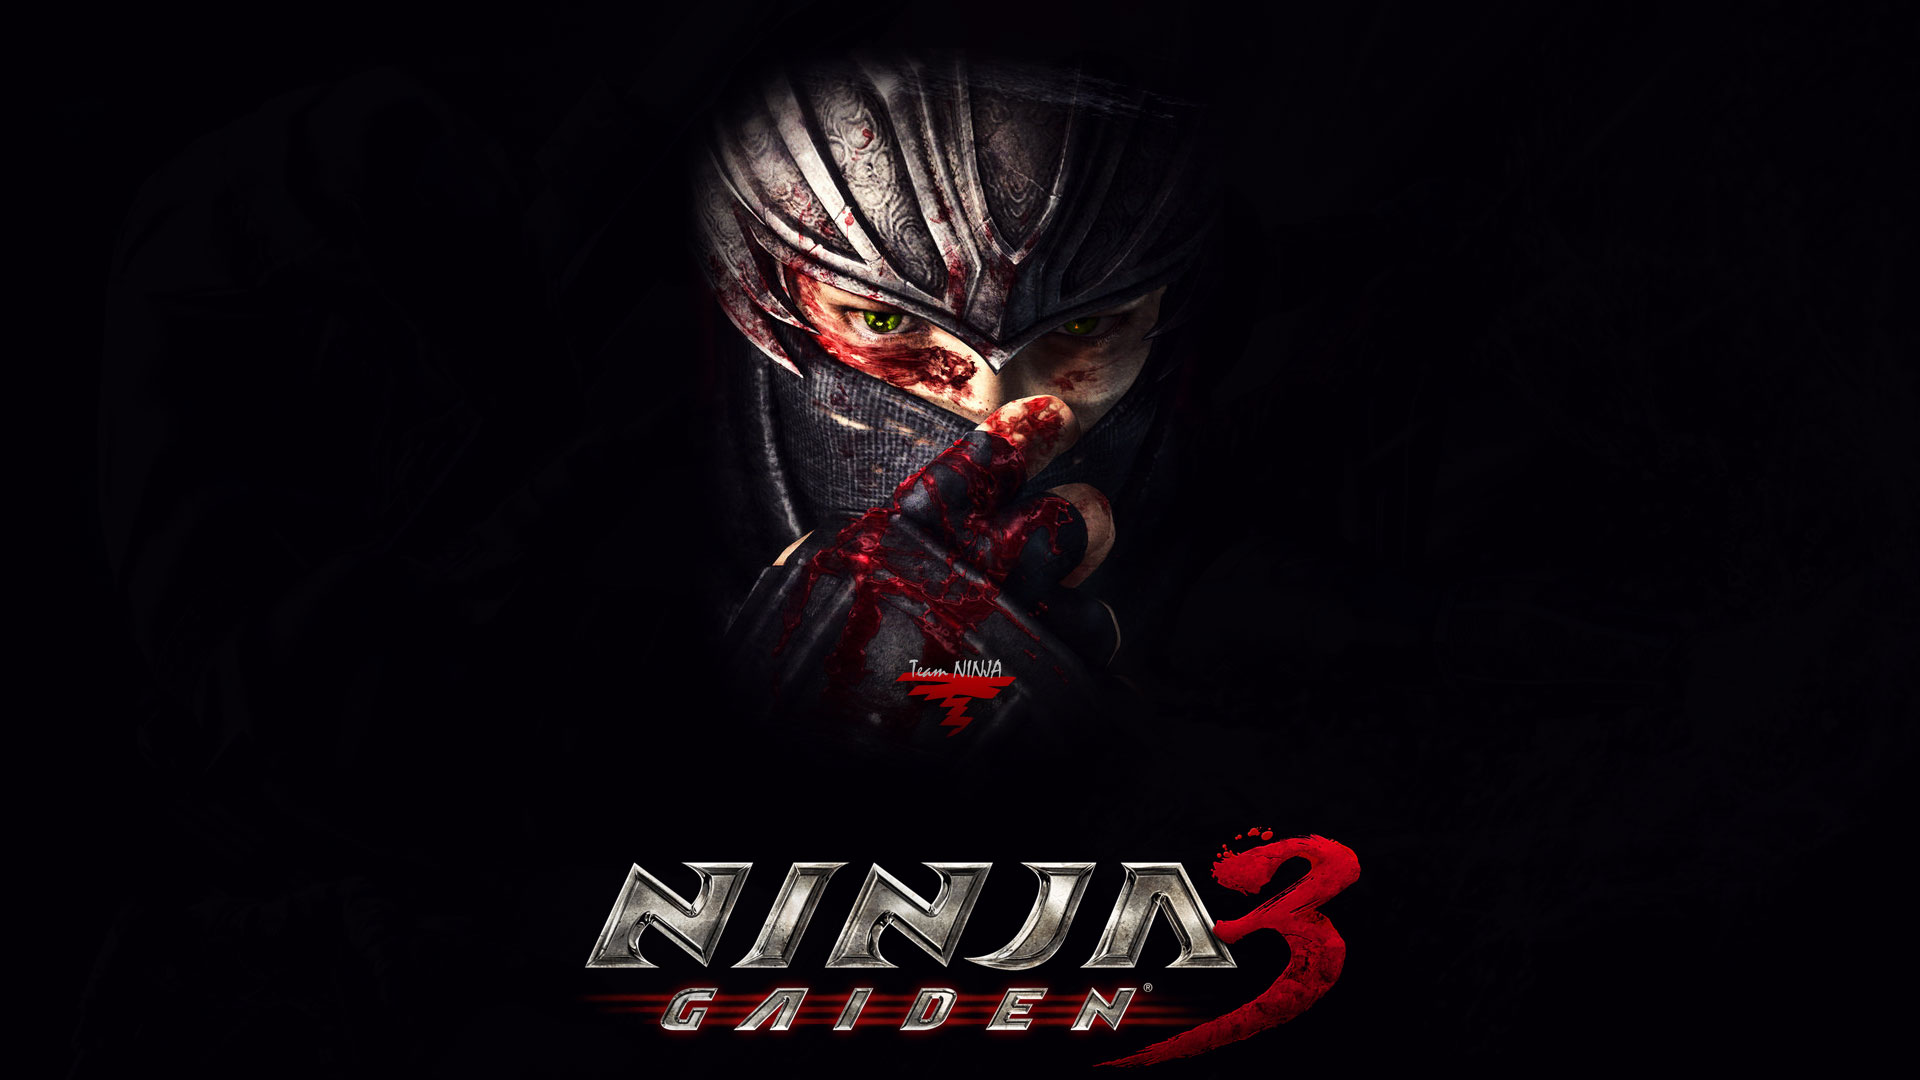 Free Download Ninja Gaiden 3 Wallpapers Ninja Gaiden Ryu